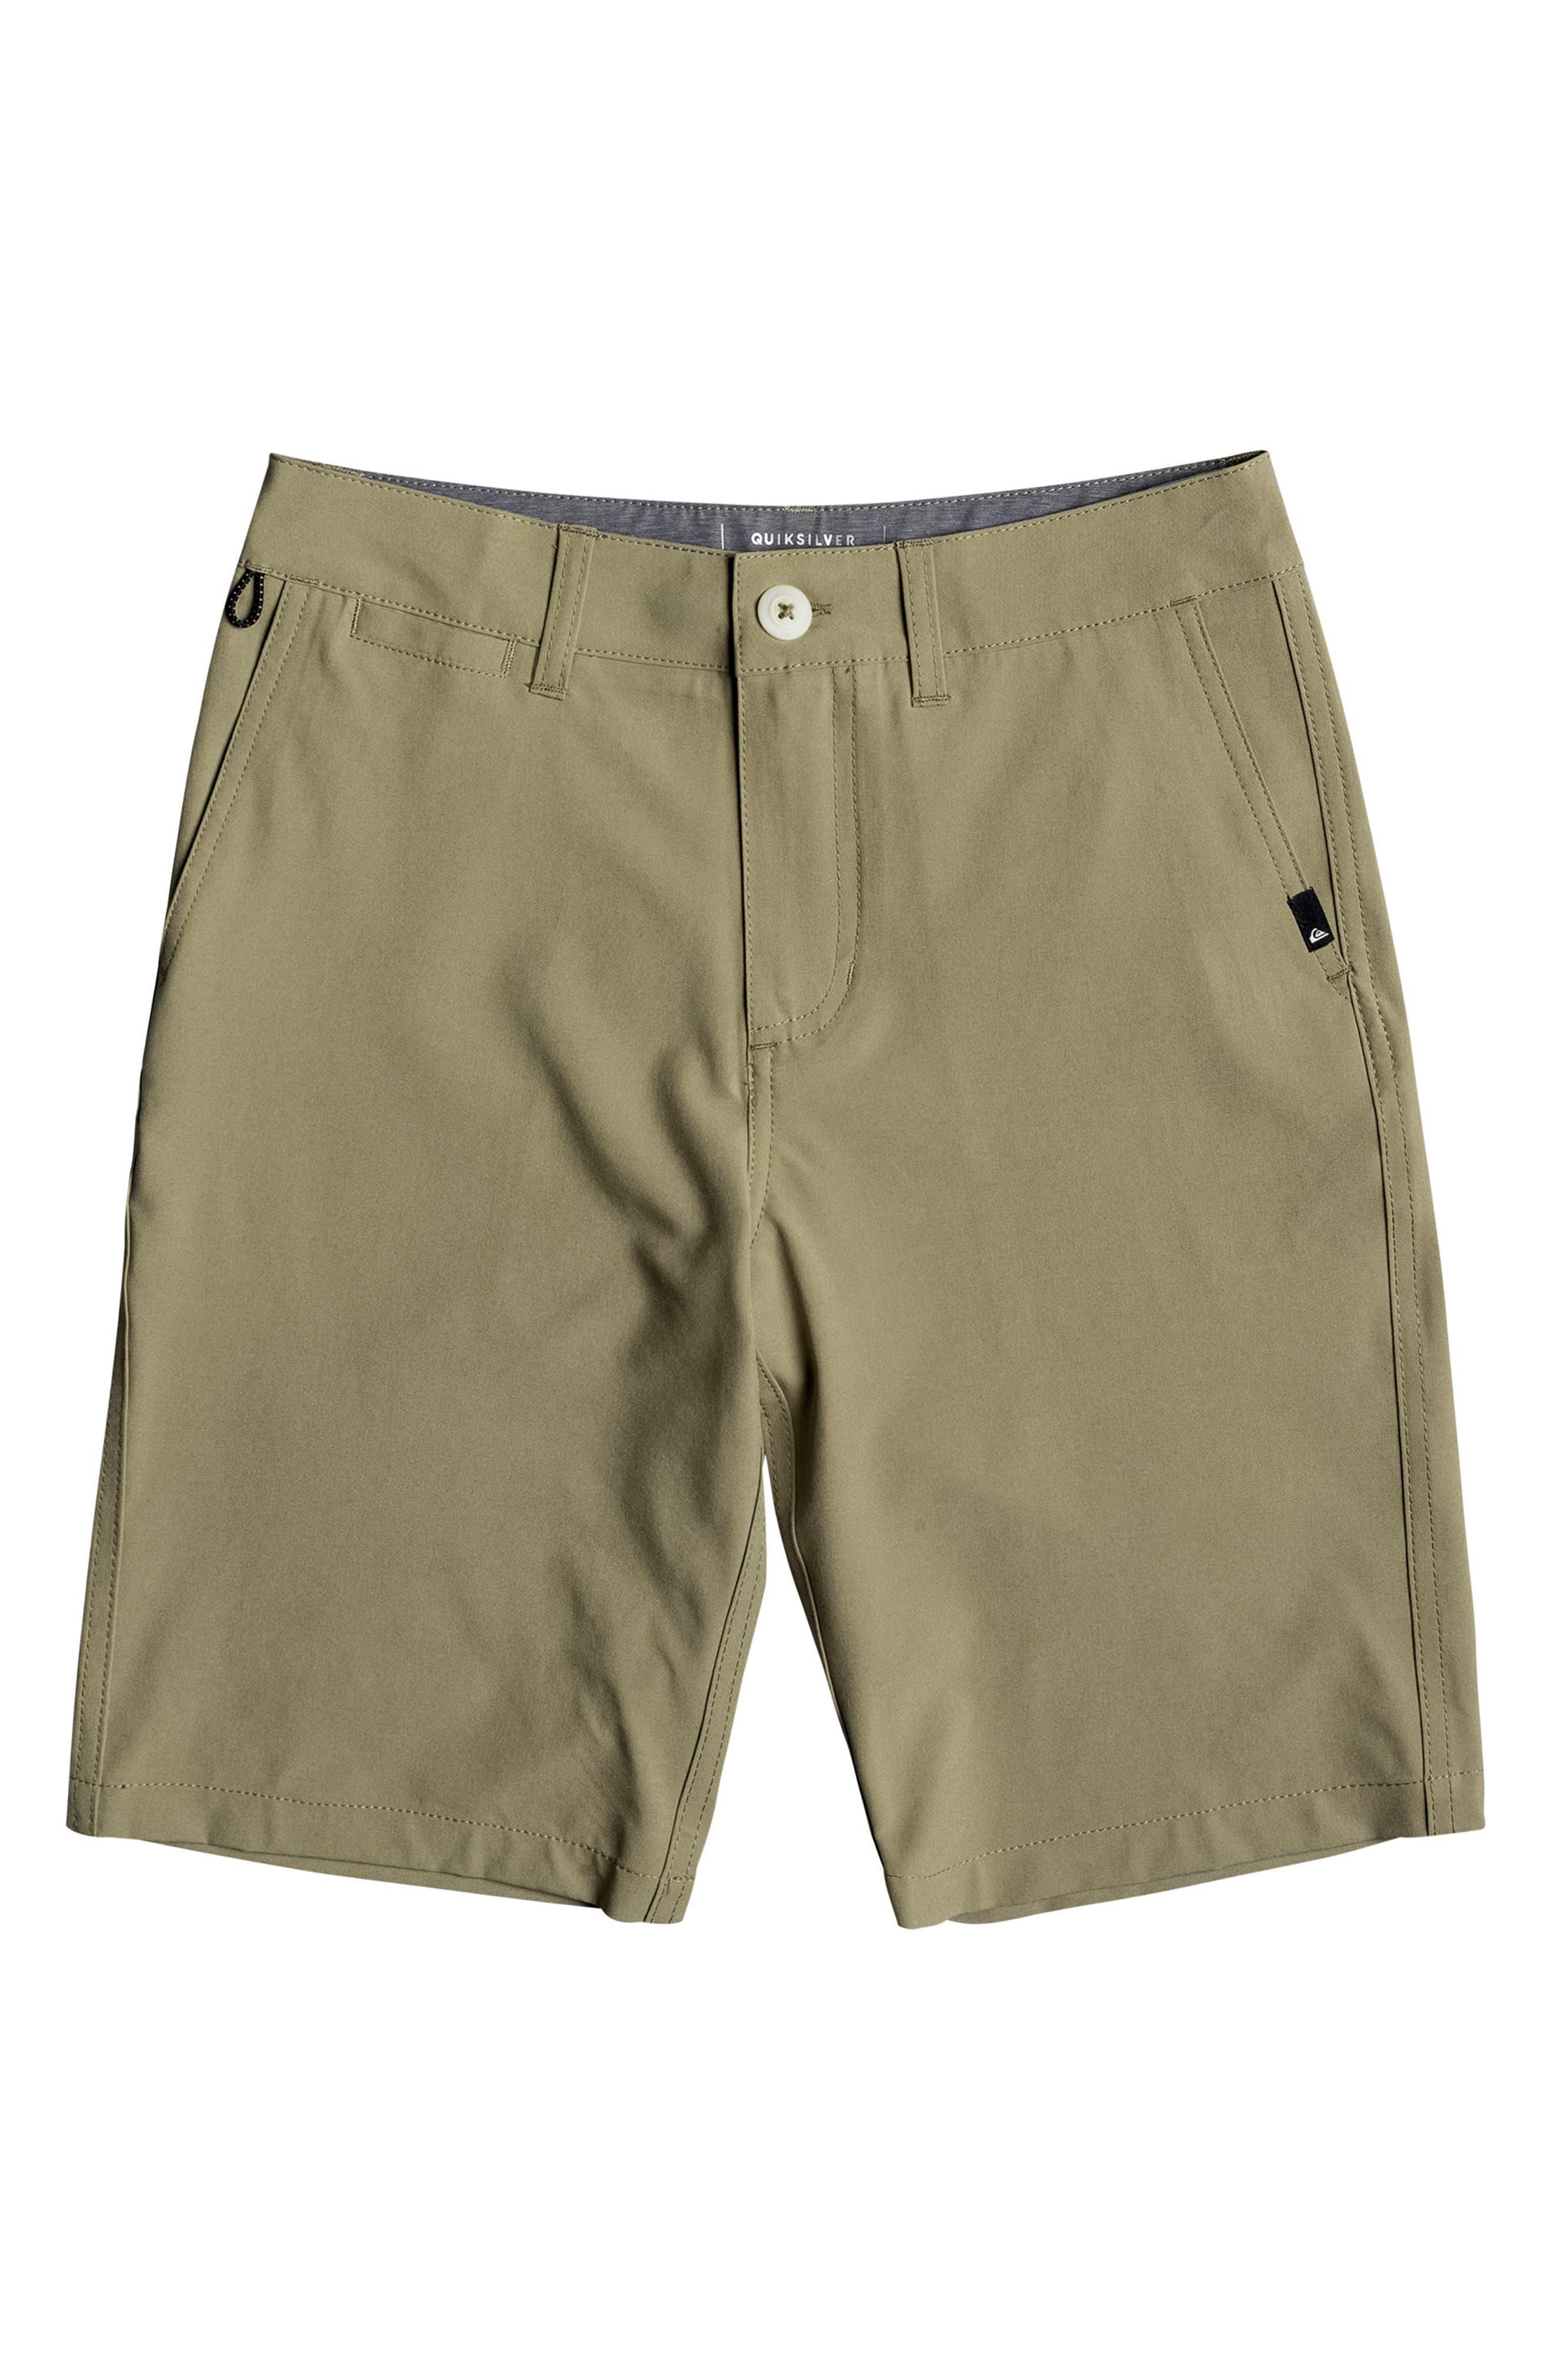 Union Amphibian Board Shorts,                             Main thumbnail 3, color,